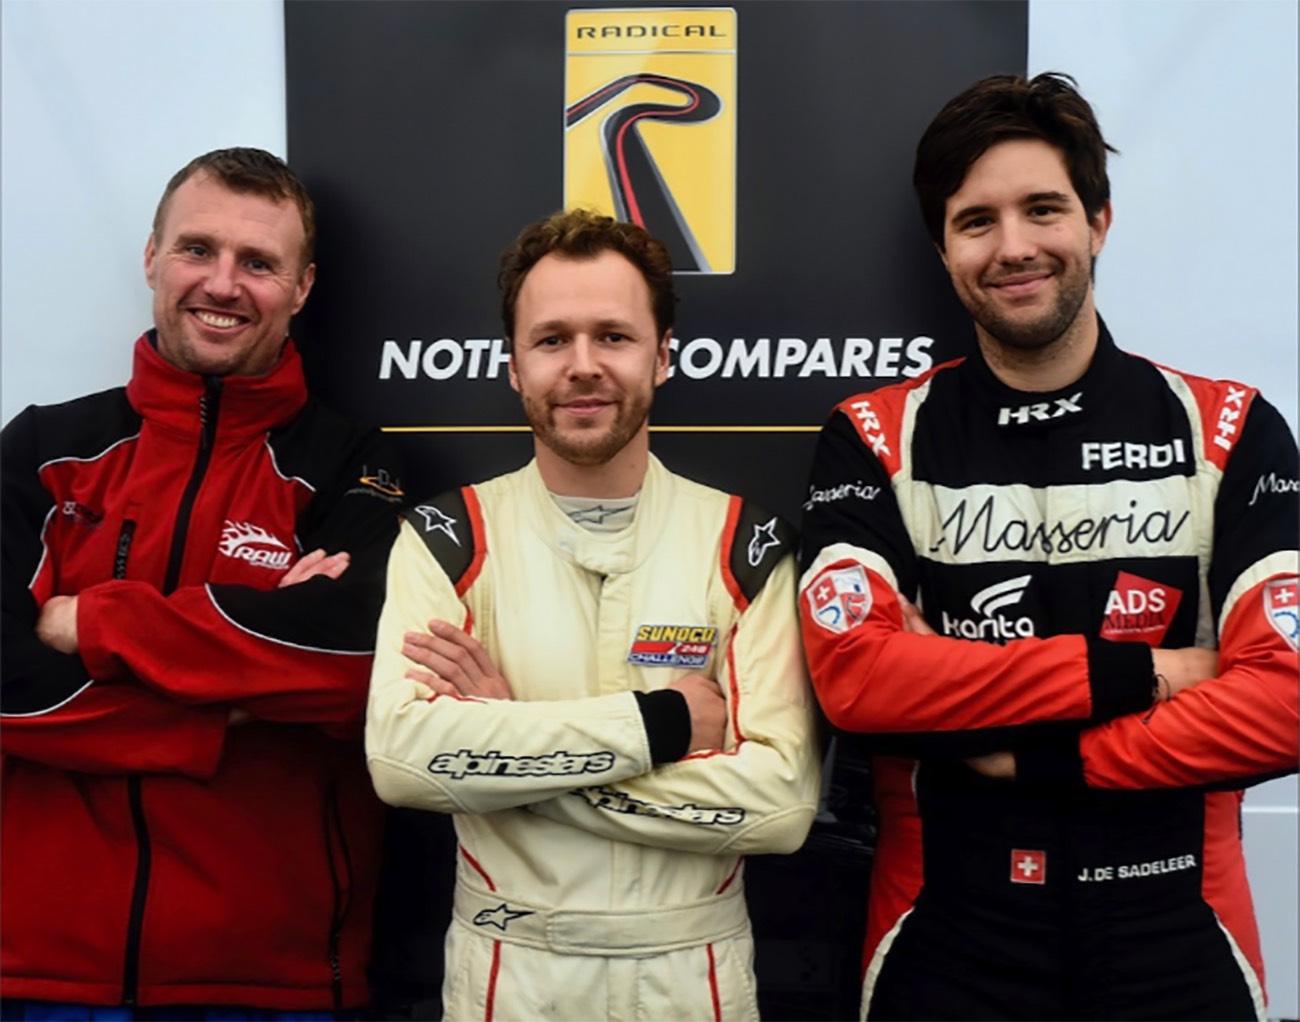 Jérôme de Sadeleer - Silverstone 2018